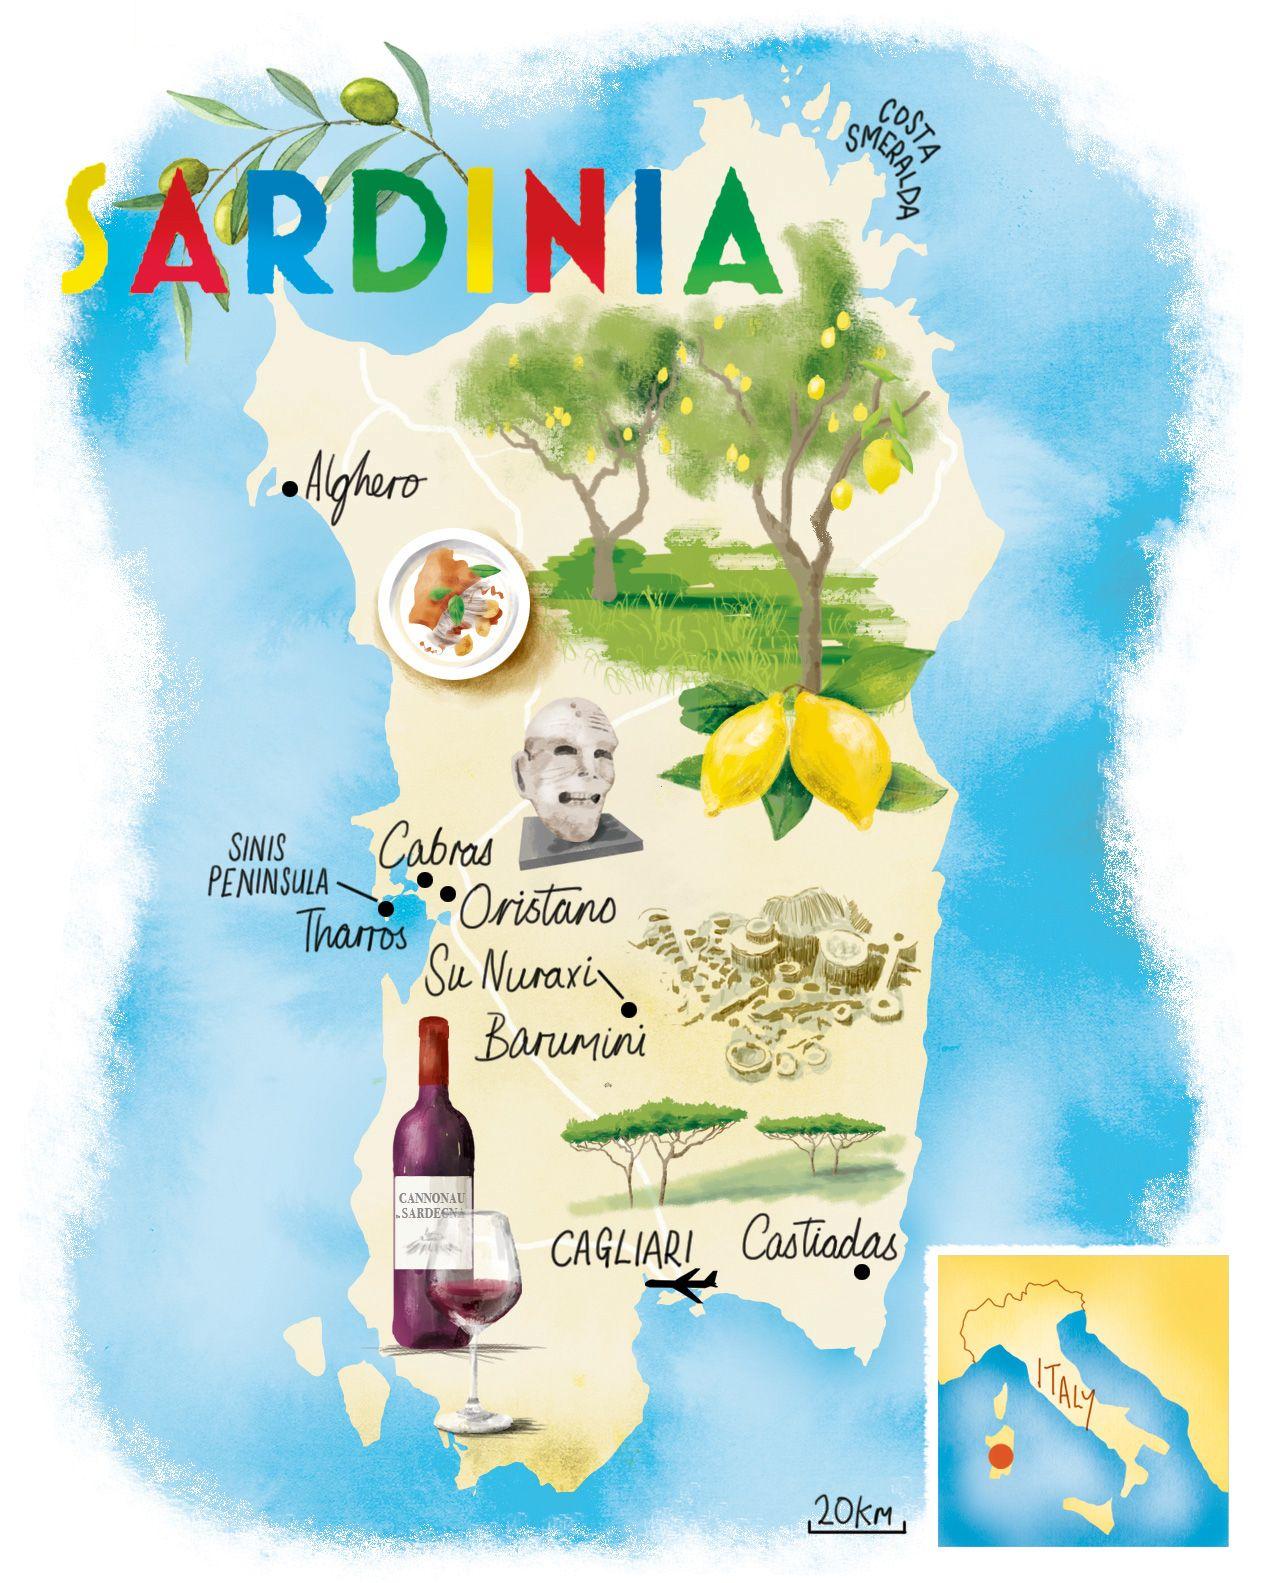 Sardinia Map By Scott Jessop Map Sardegna Sadrinia Italy